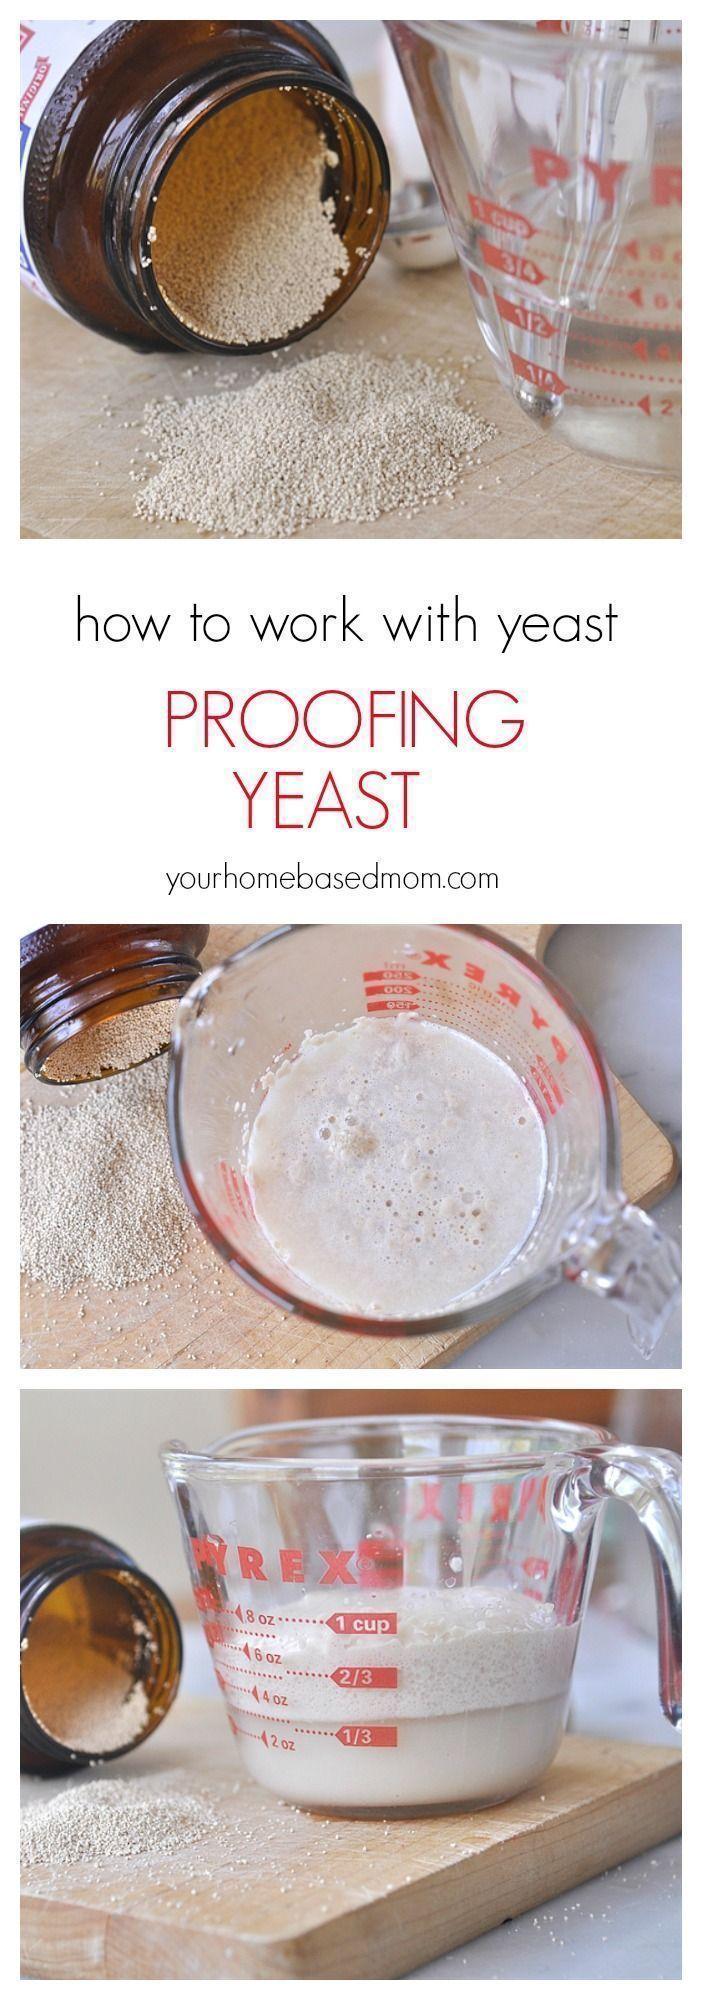 How to Proof Yeast #cookingandhouseholdhints